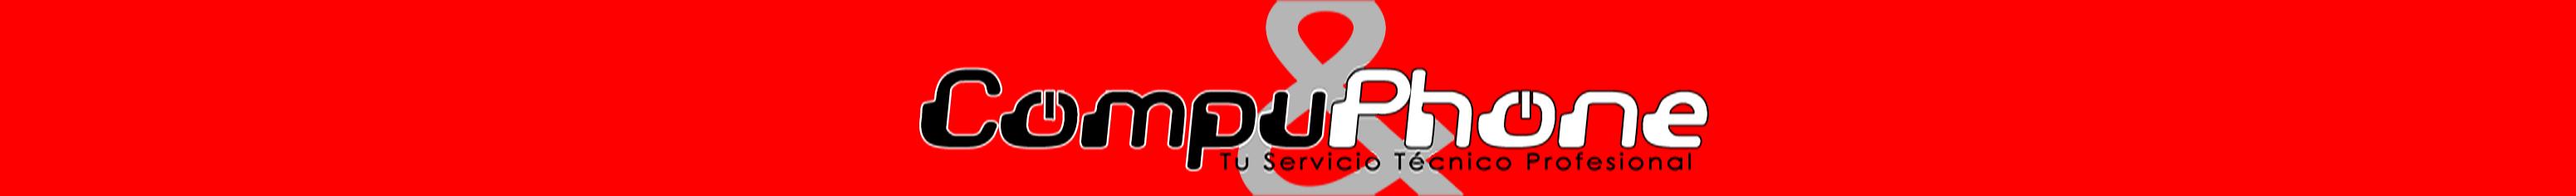 Compu&Phone. Tu Servicio Tecnico Profesional | Reparacion Moviles Almeria | Tablets | Ordenadores | Reparacion Portatil | Almeria